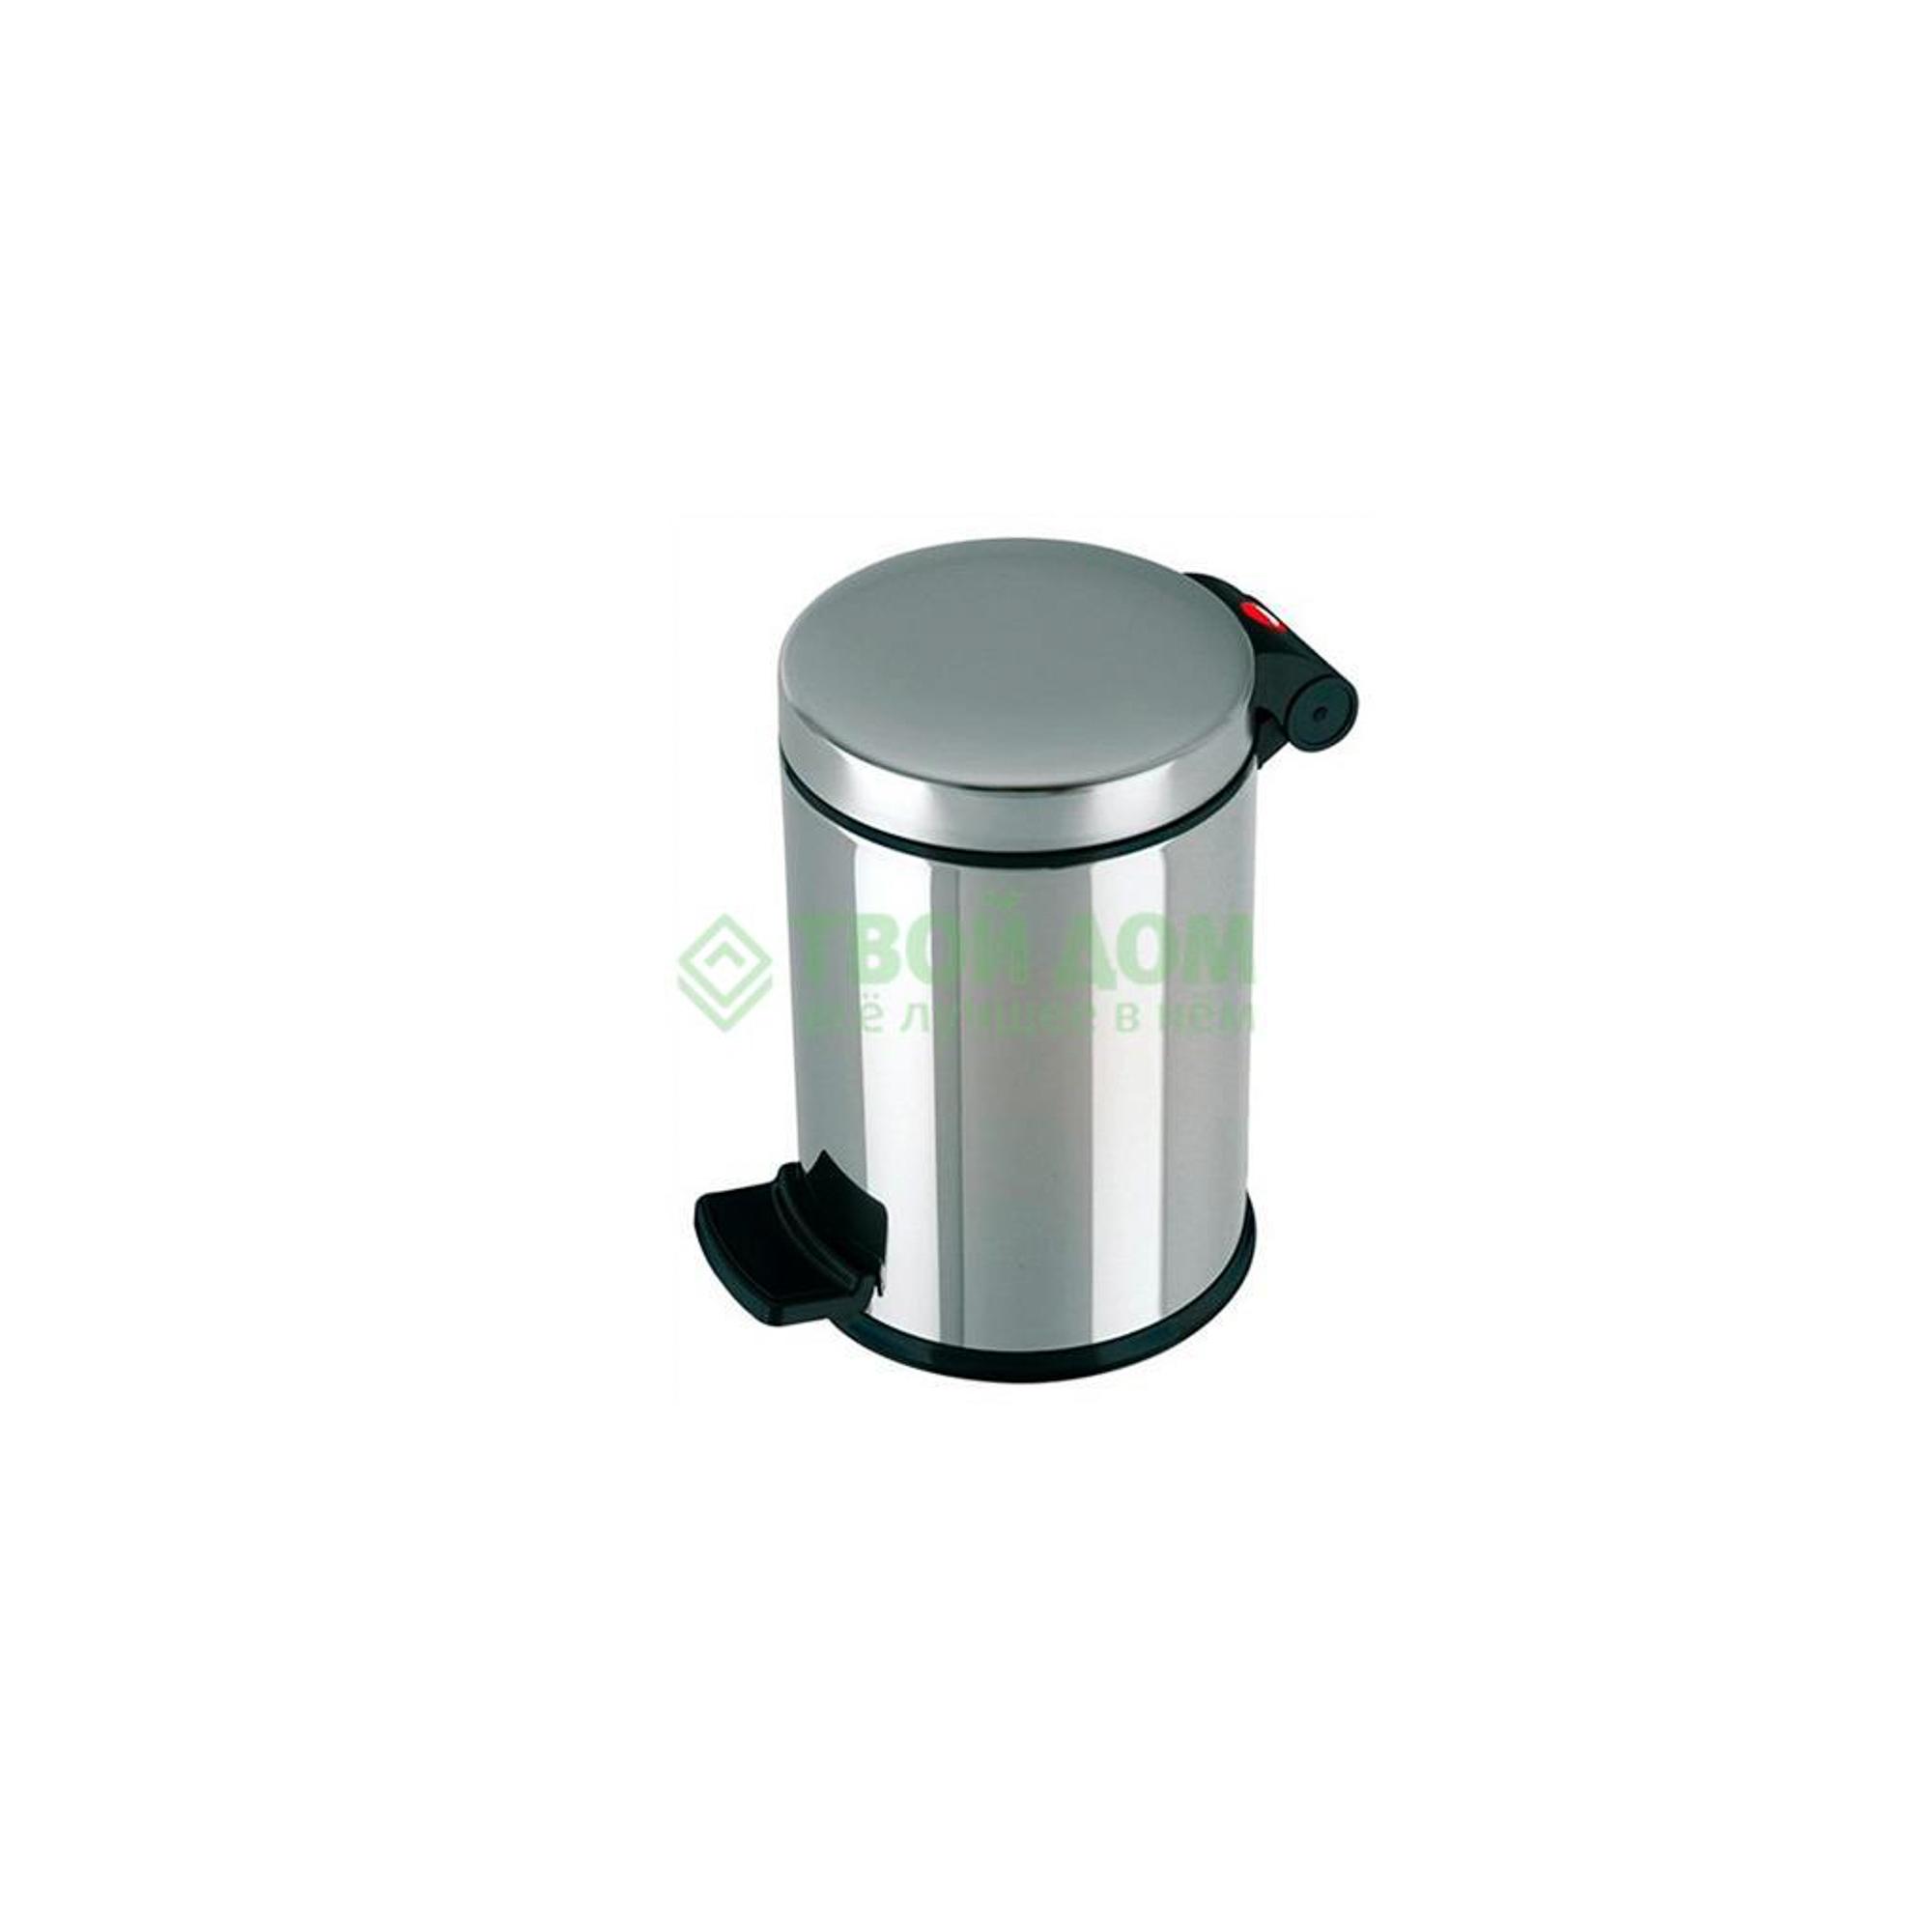 Контейнер для мусора Hailo 0704-060 (0704-060)